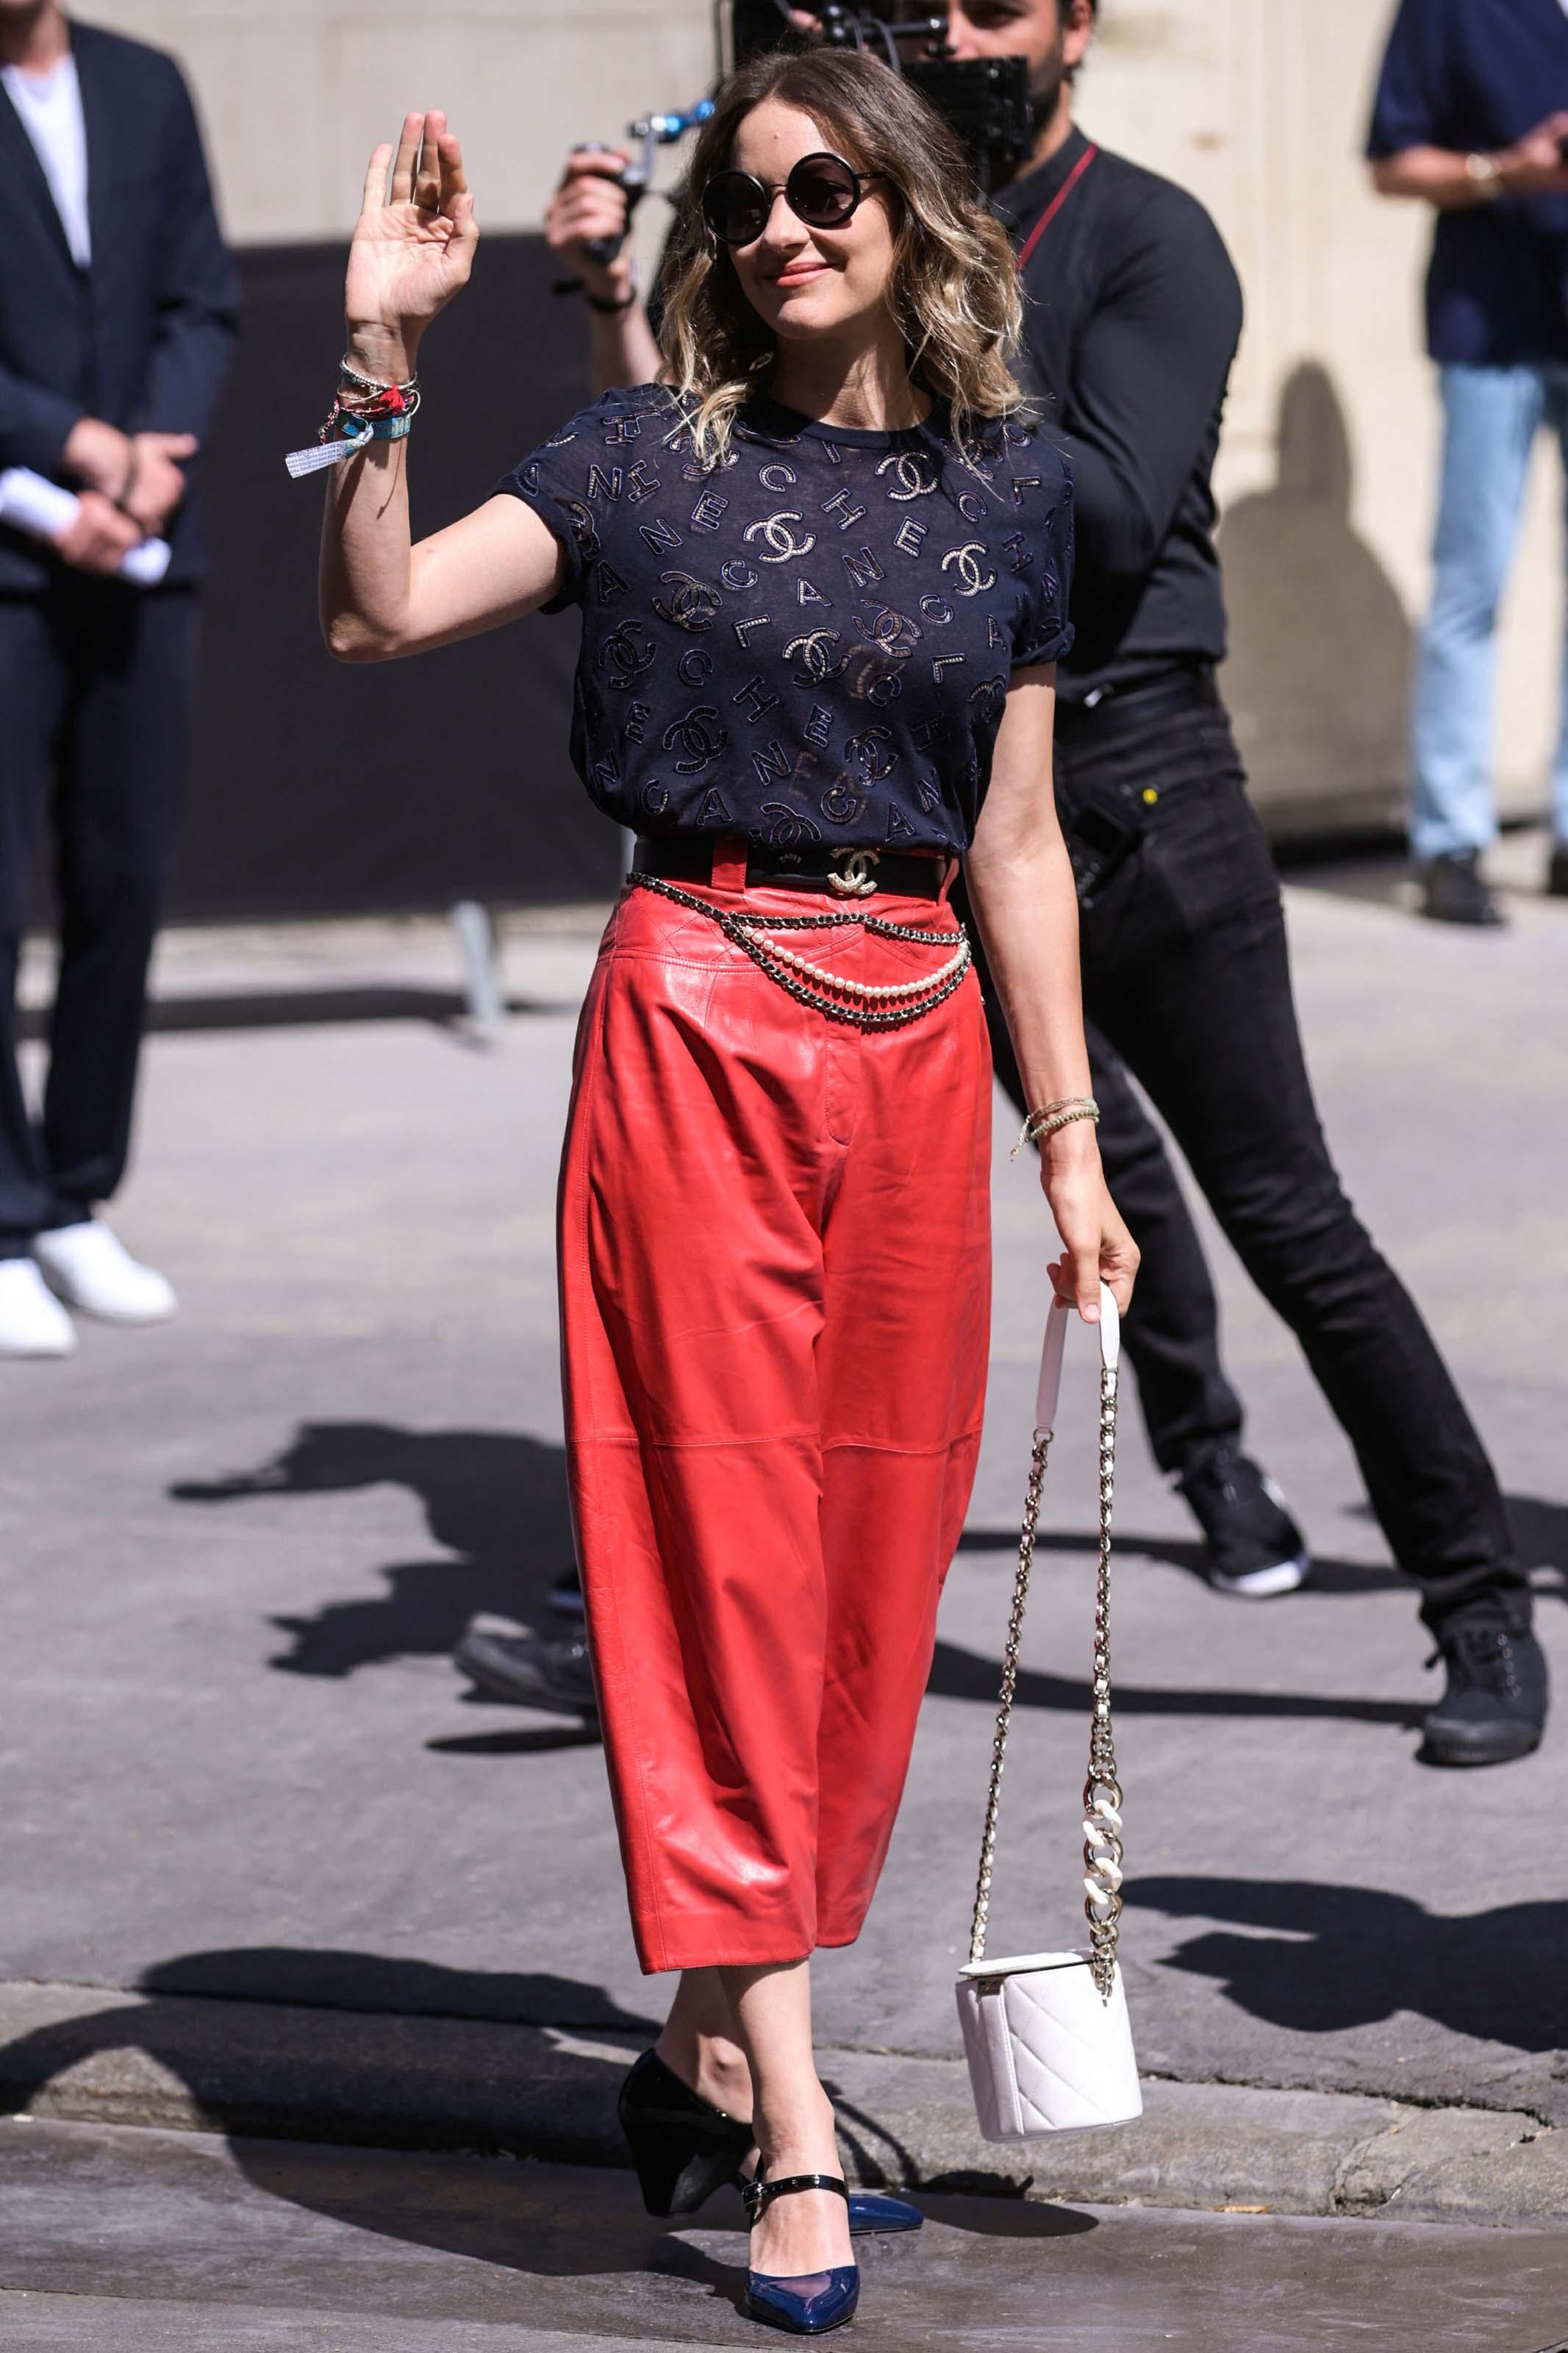 Marion Cotillard attends Chanel Haute Couture